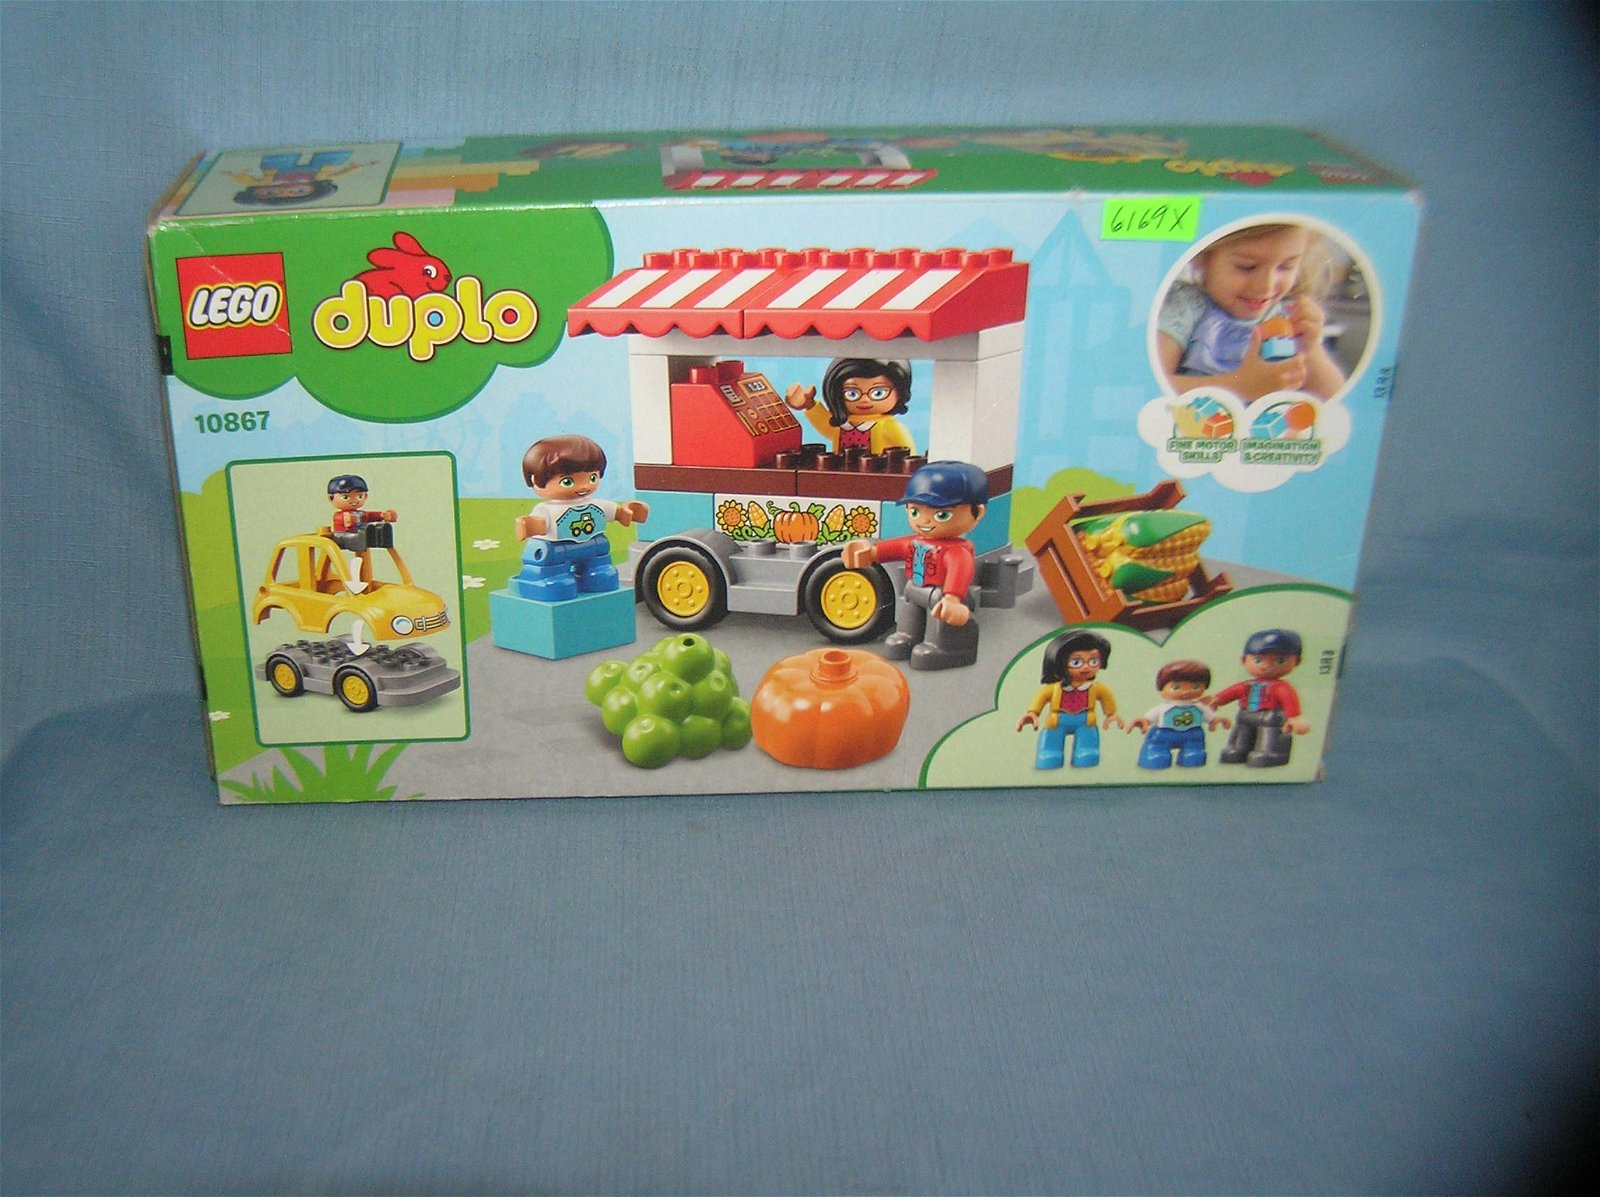 Lego play set mint in original box